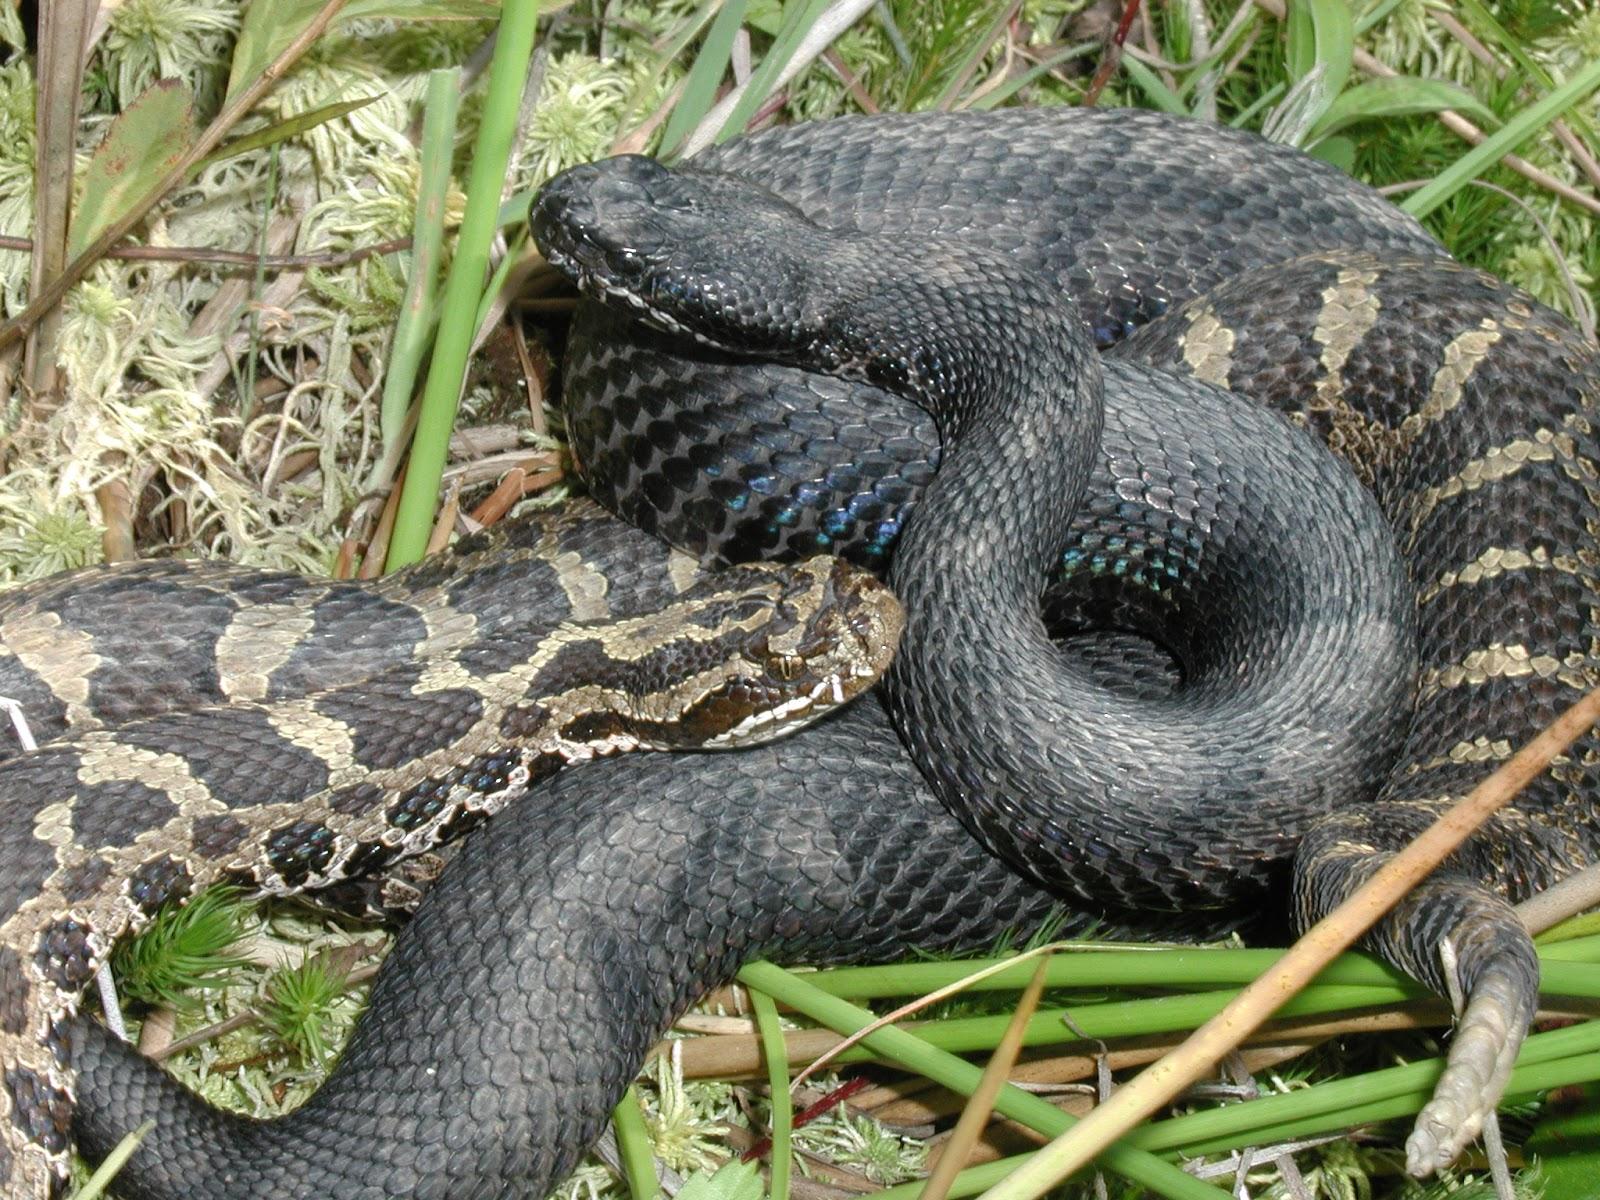 Alabama black snake 5 - 5 5